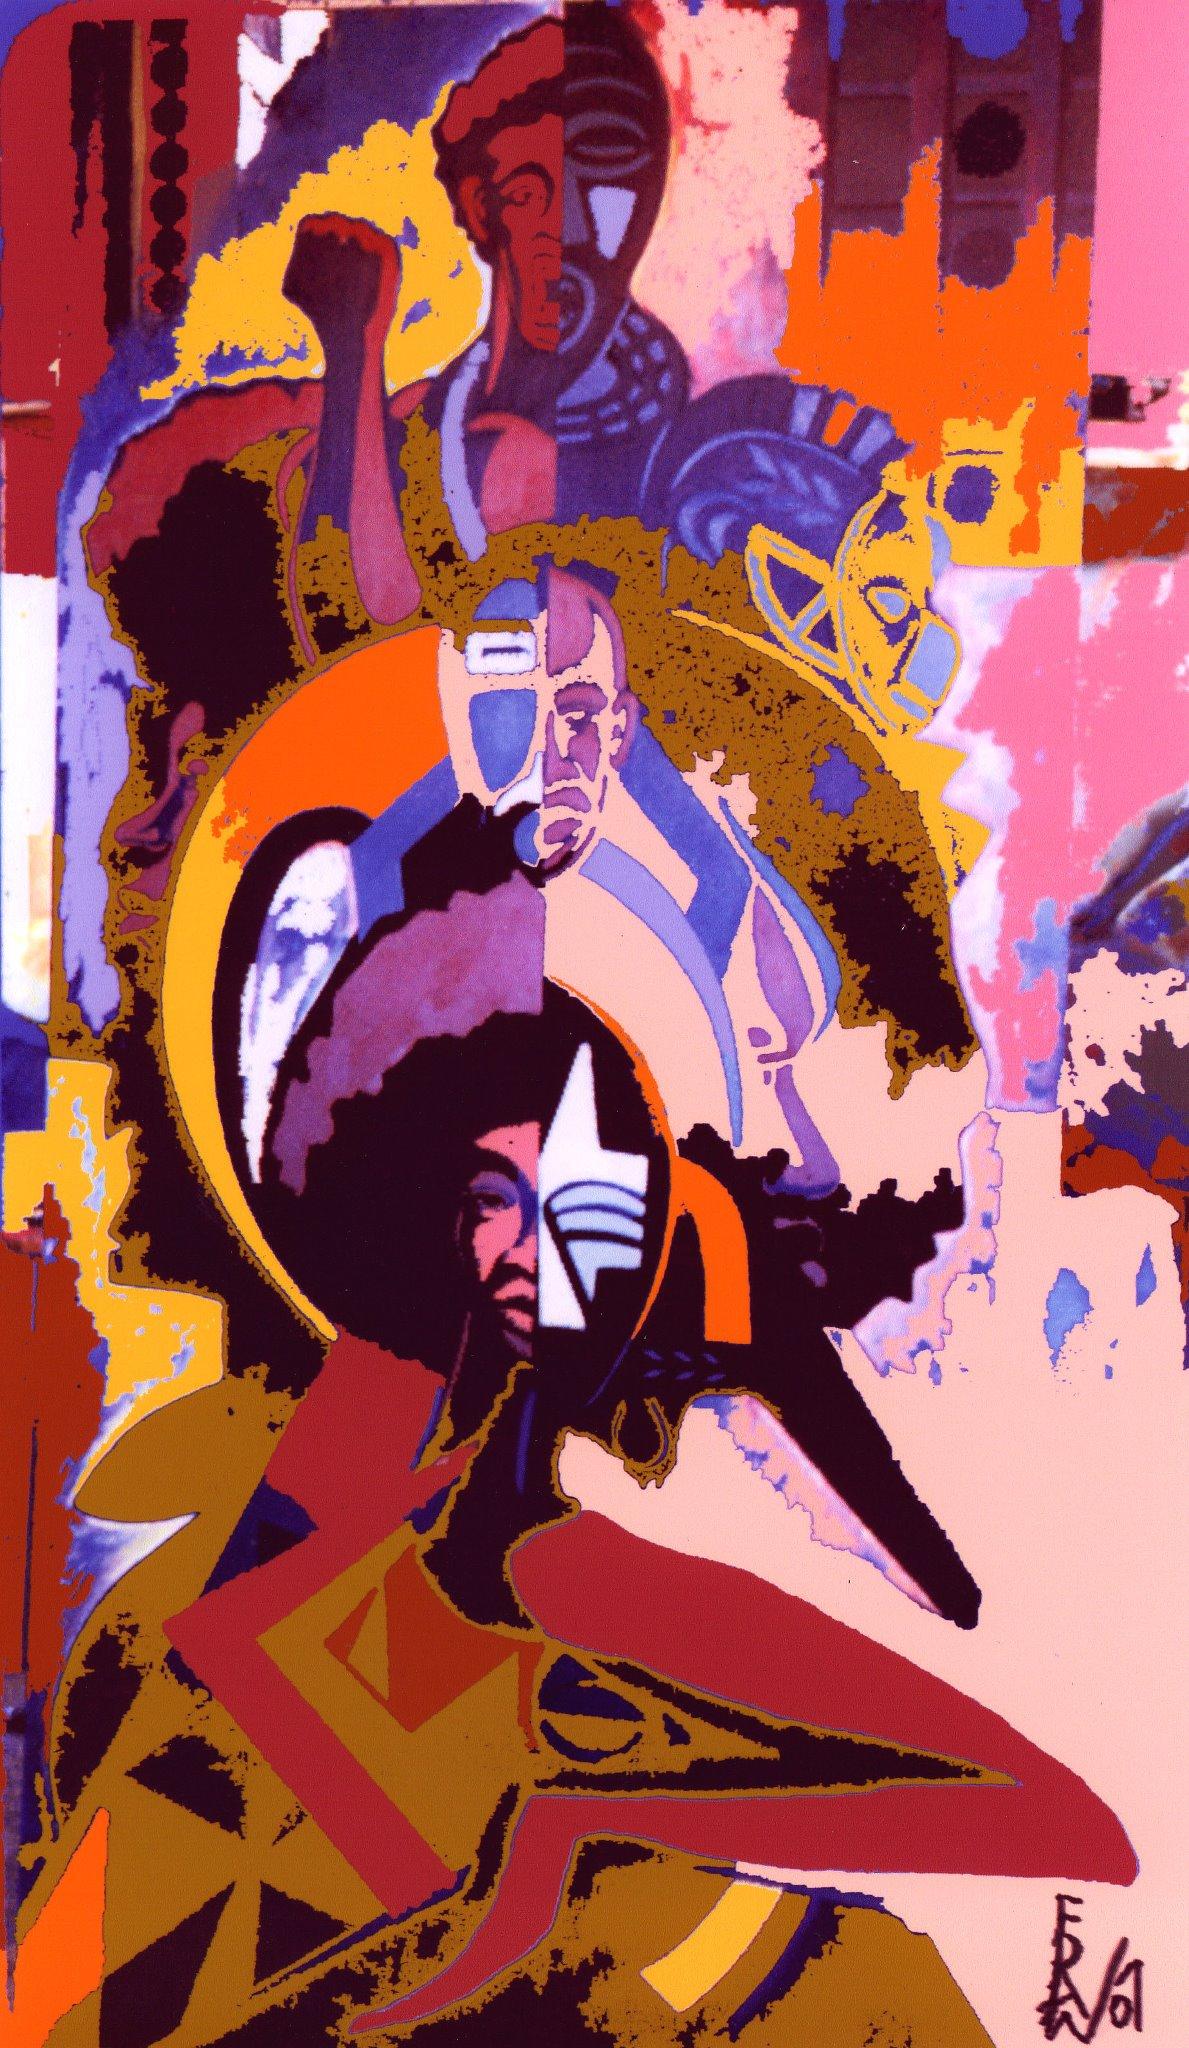 Malcolm, Angela, Martin. Digital Art on Canvas by Eda Wade. 2007